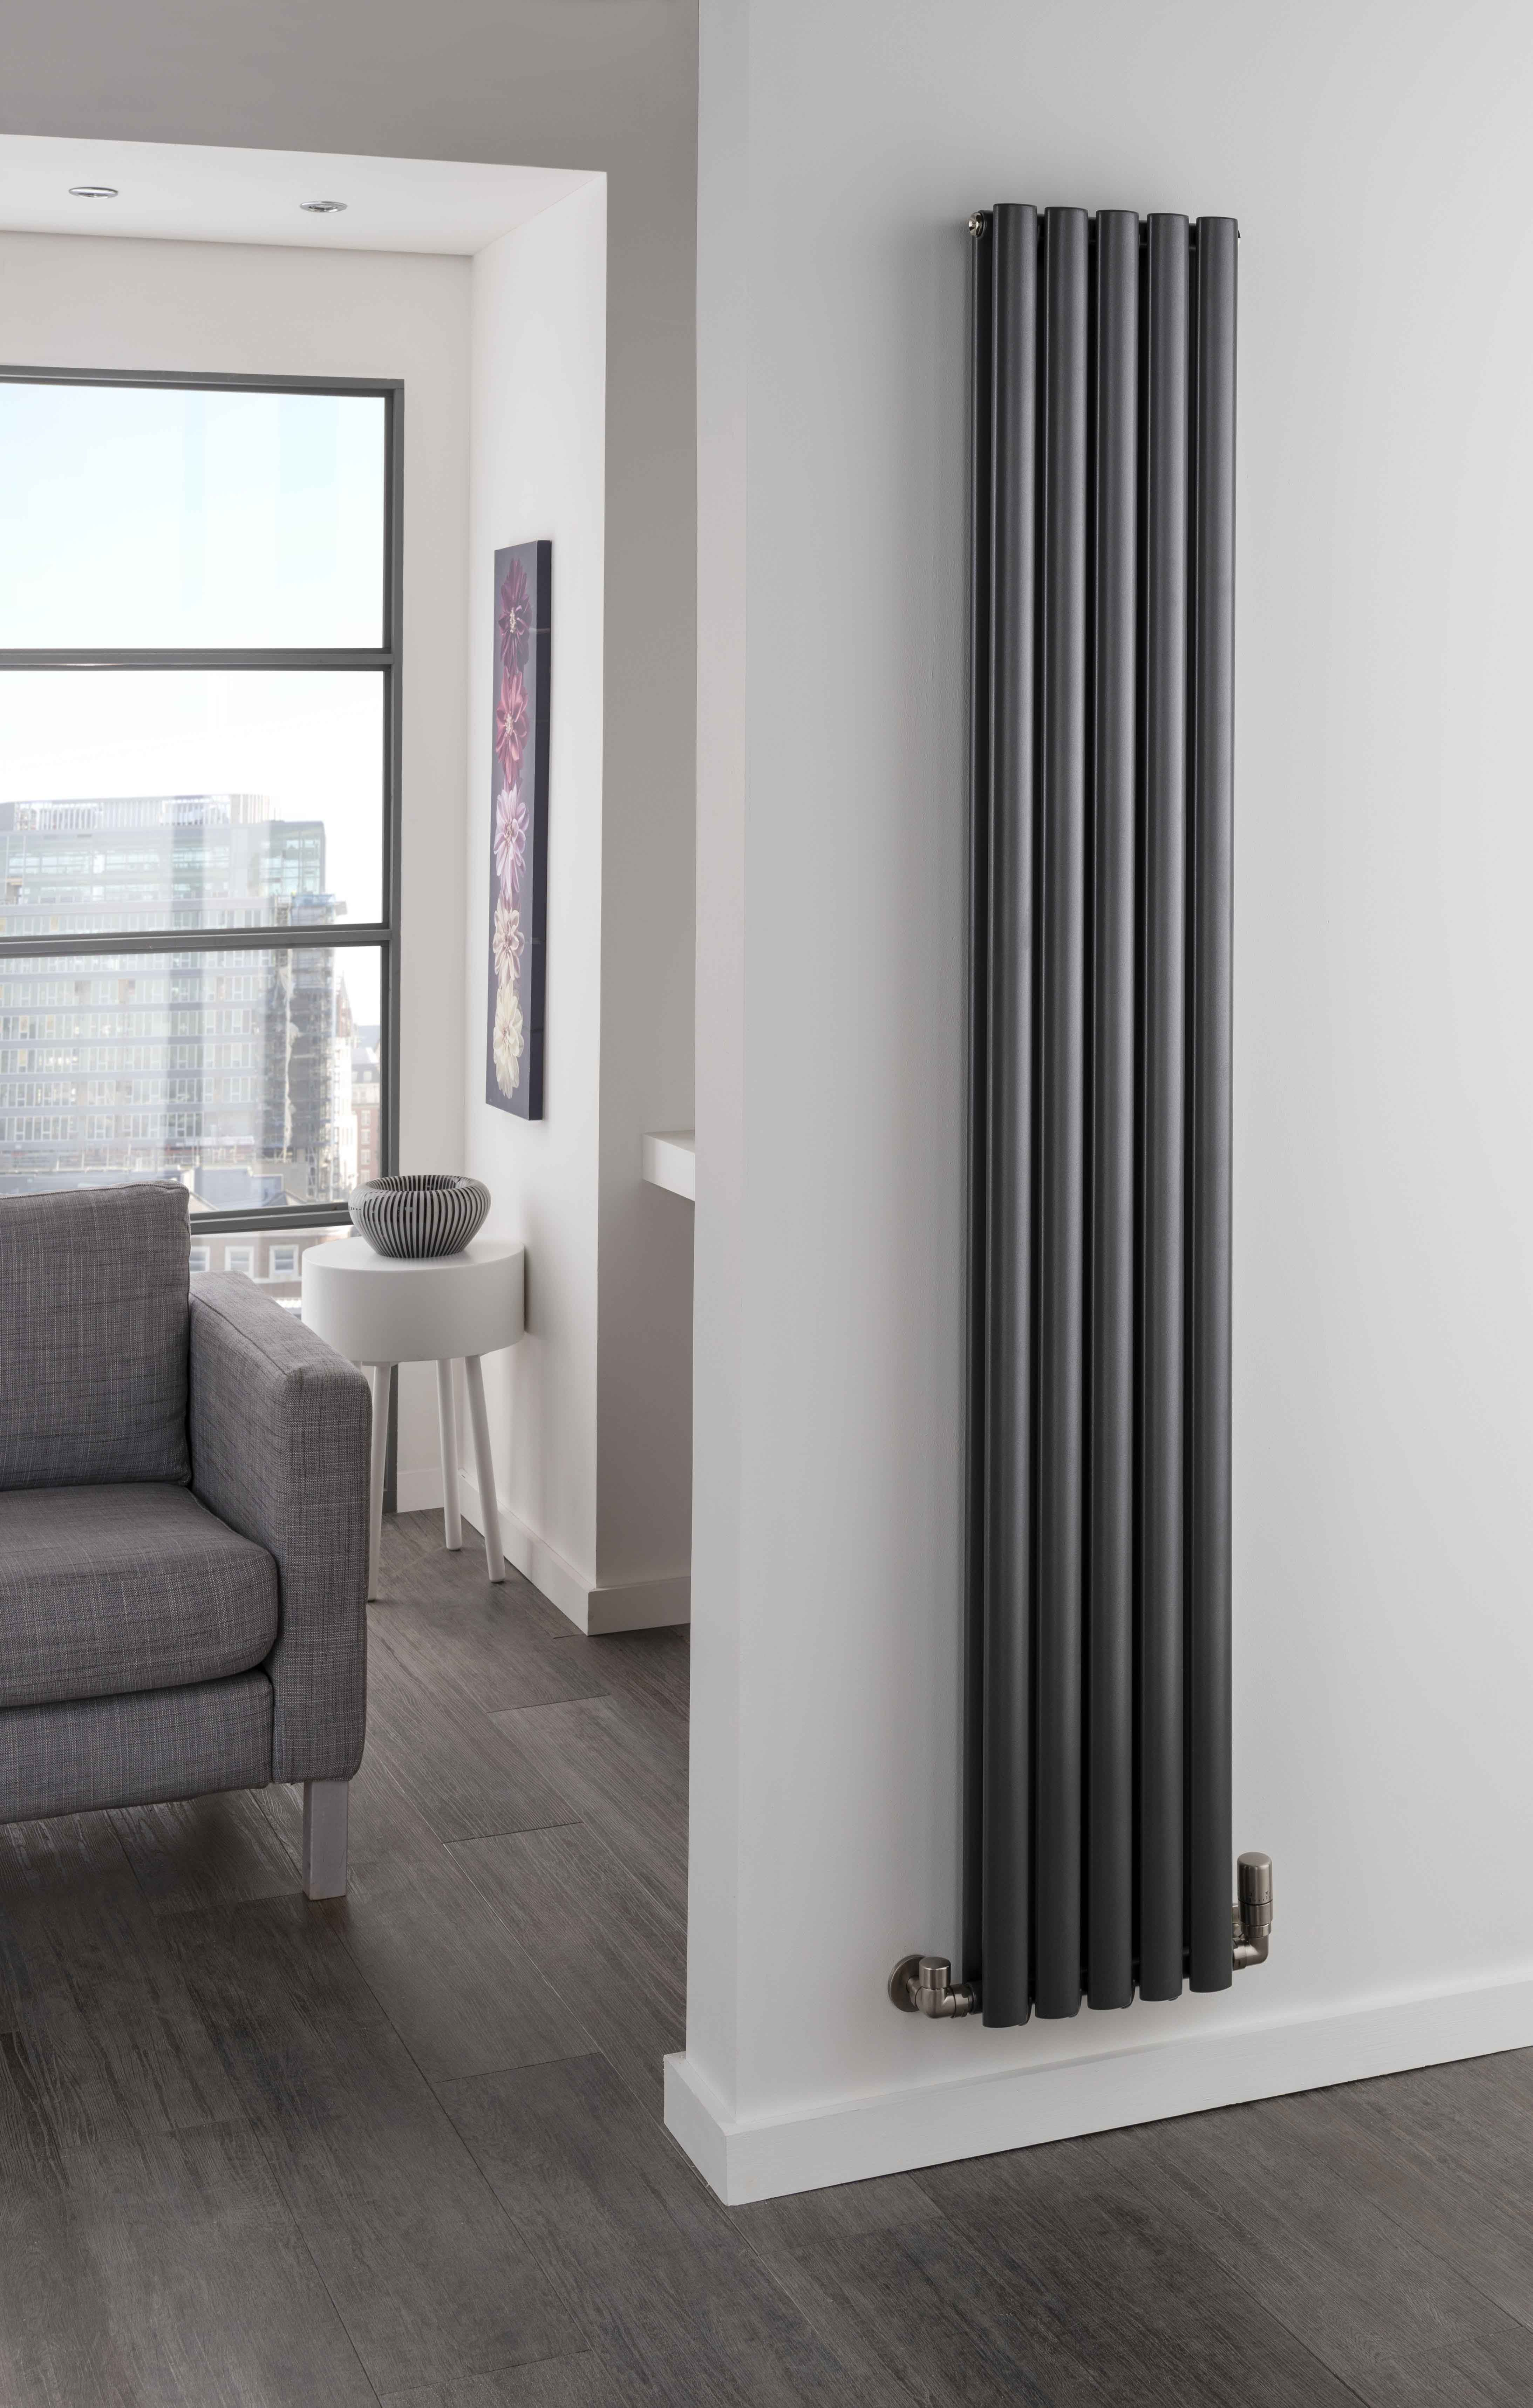 Designer Living Room Radiators: The Radiator Company Ellipsis Double Vertical Radiator